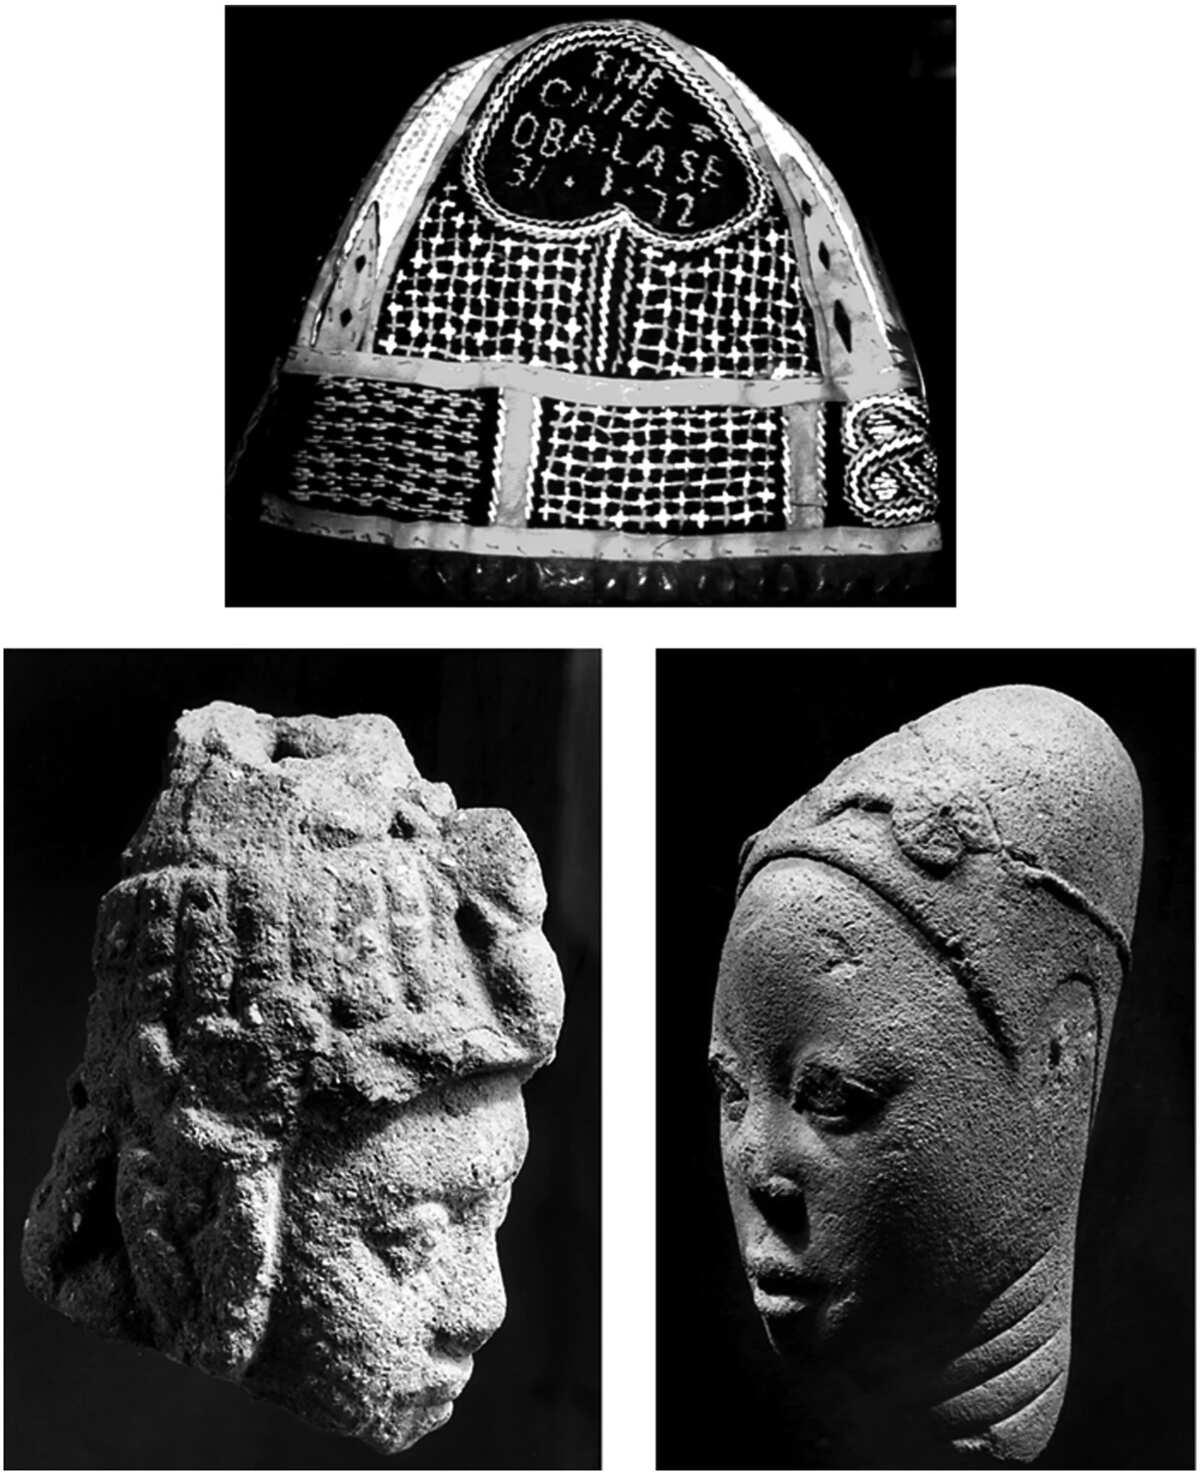 Ogboni fraternity cult: rituals, symbols, hand sign, human sacrifice